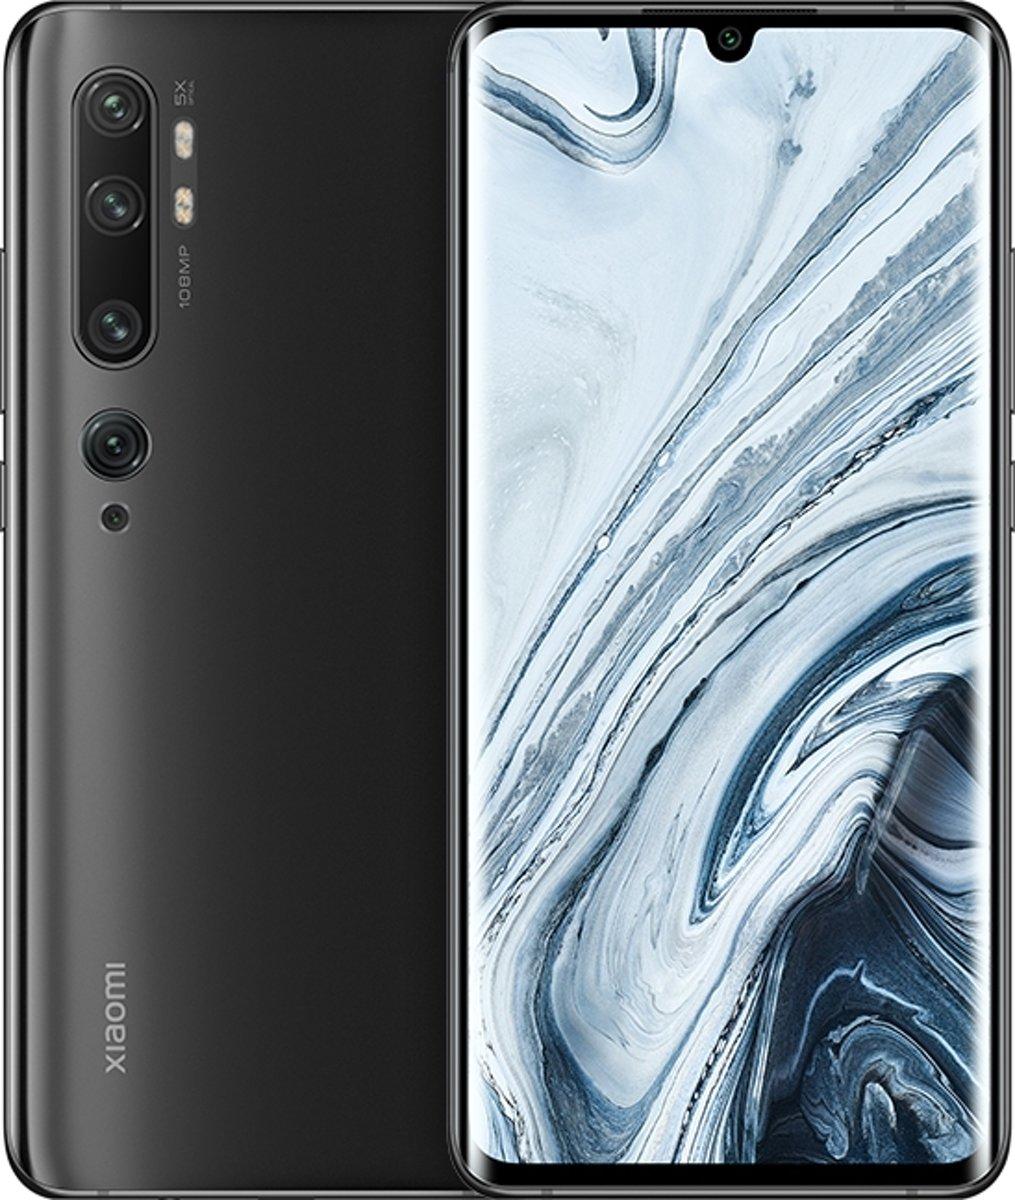 Xiaomi Mi Note 10 6GB 128GB Andr Black kopen